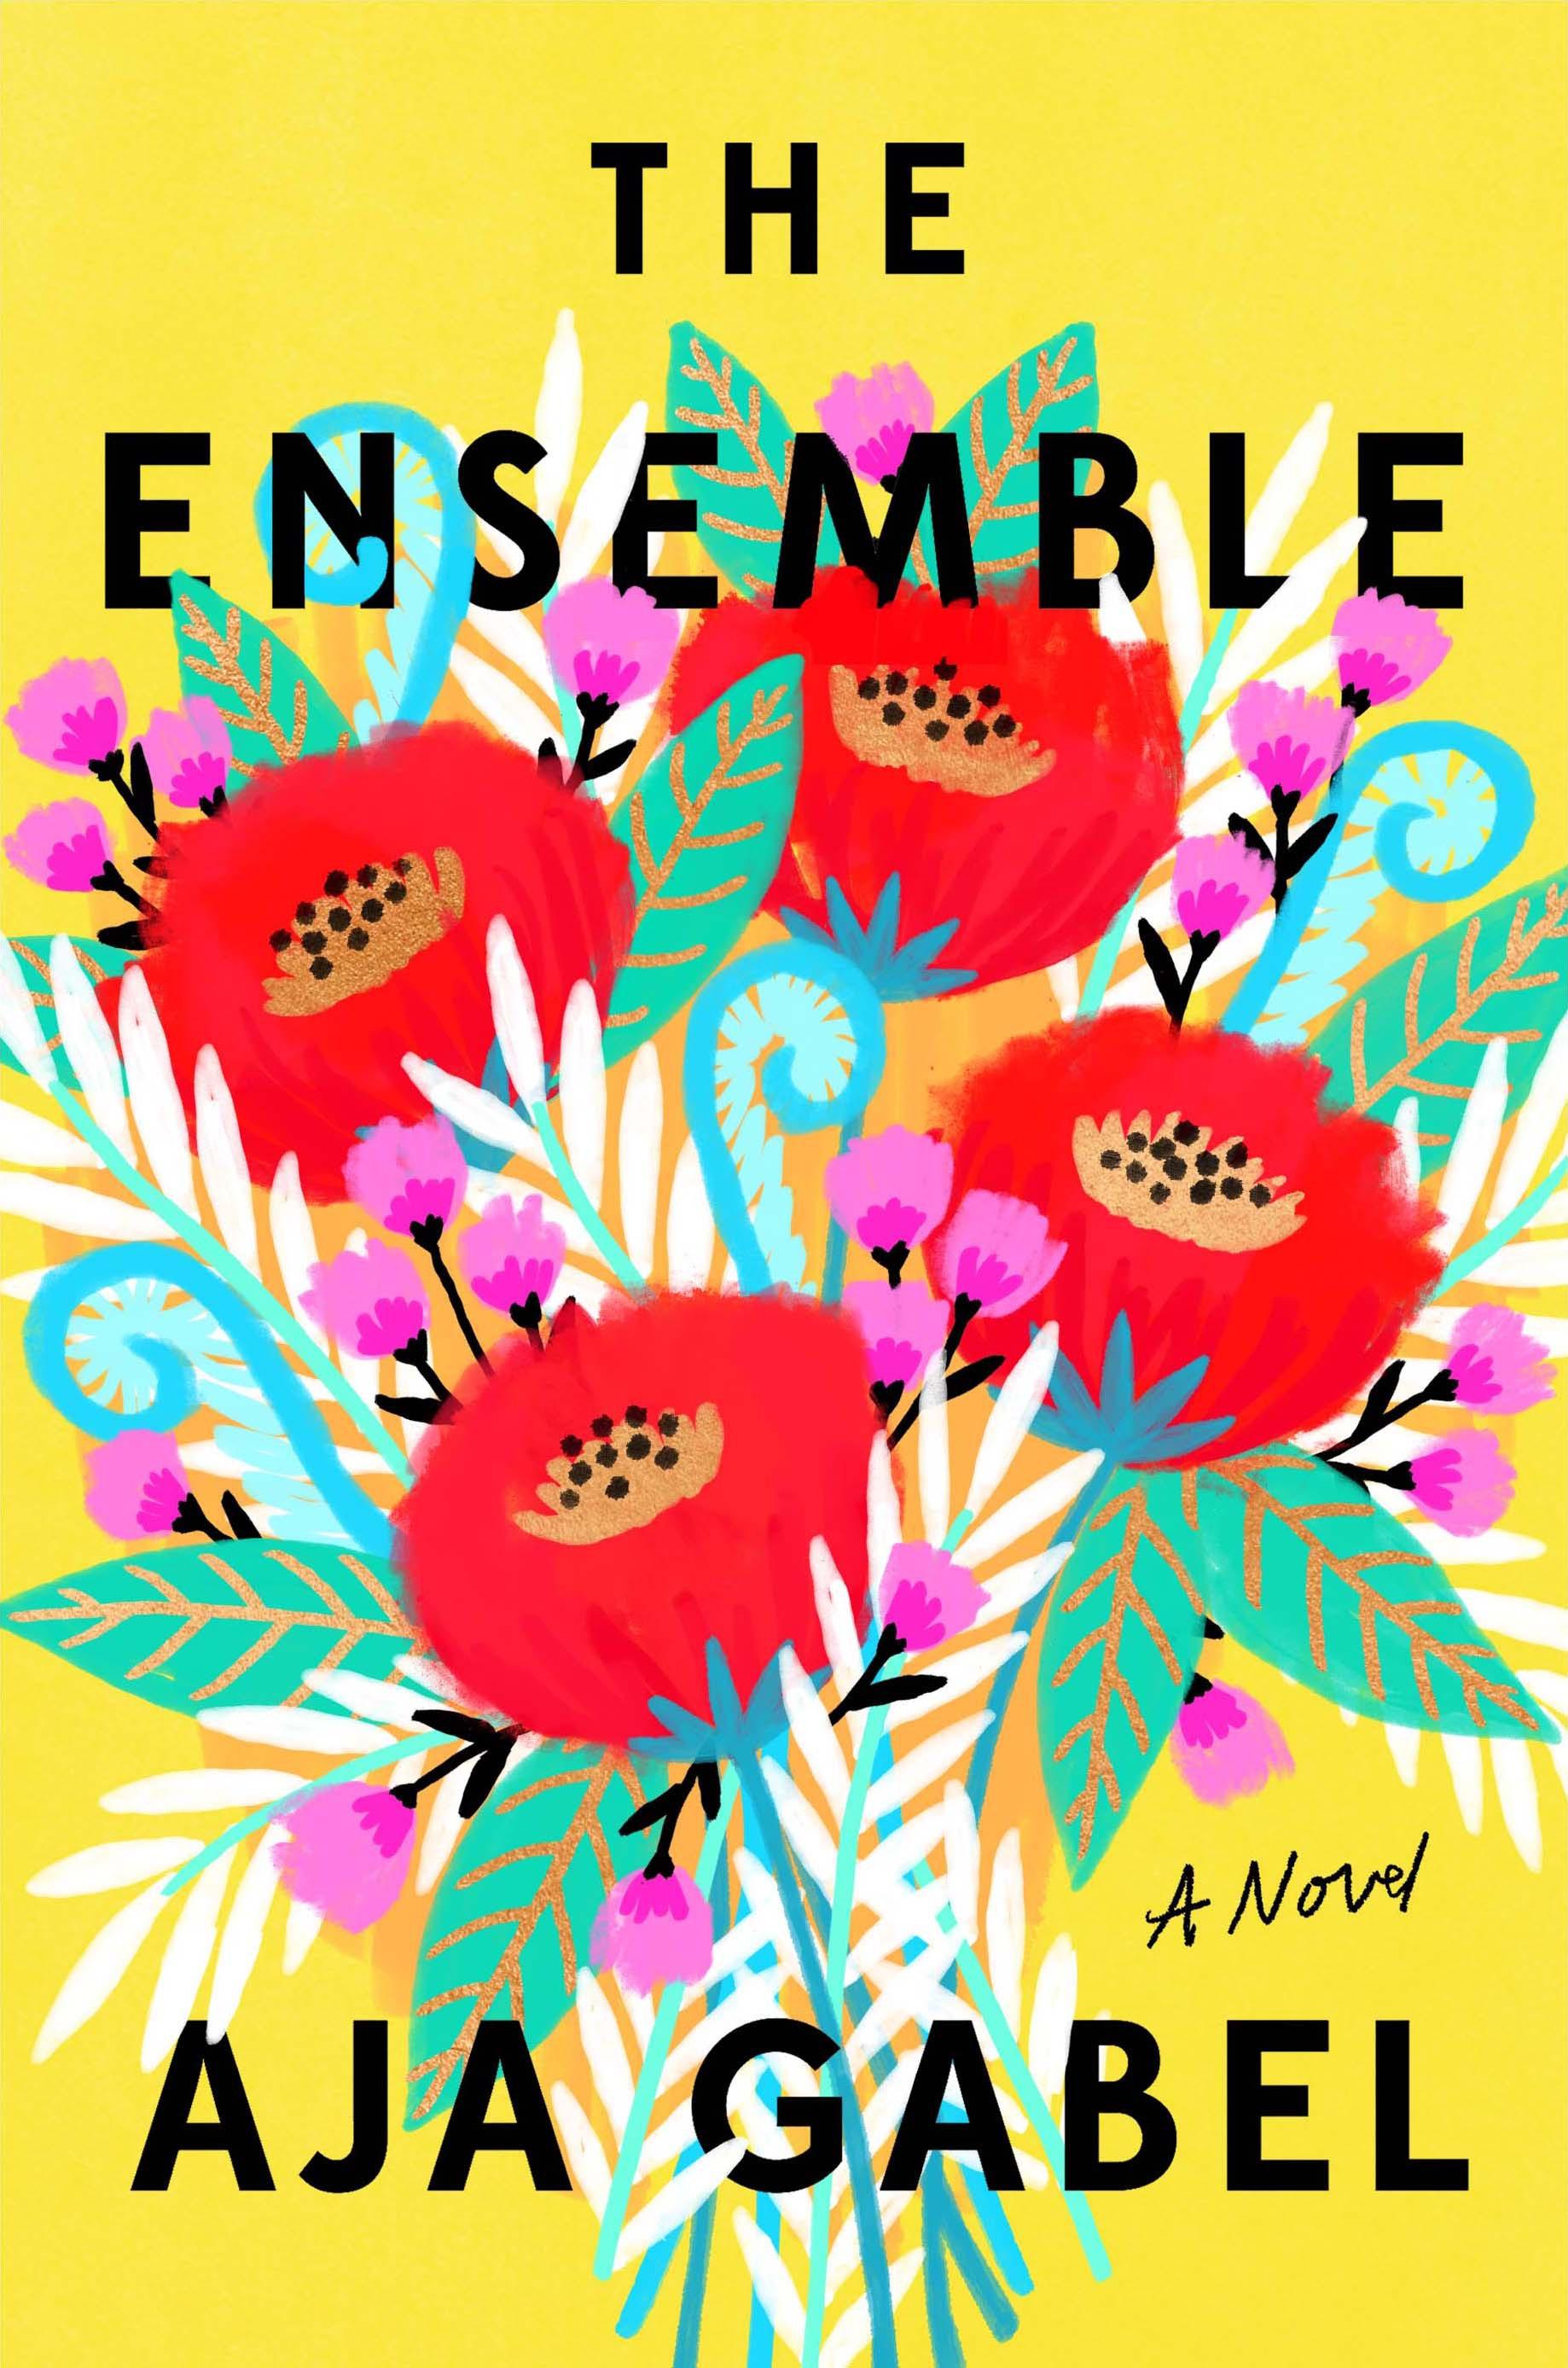 the ensemble, aja gabel, book, novel, fiction, riverhead